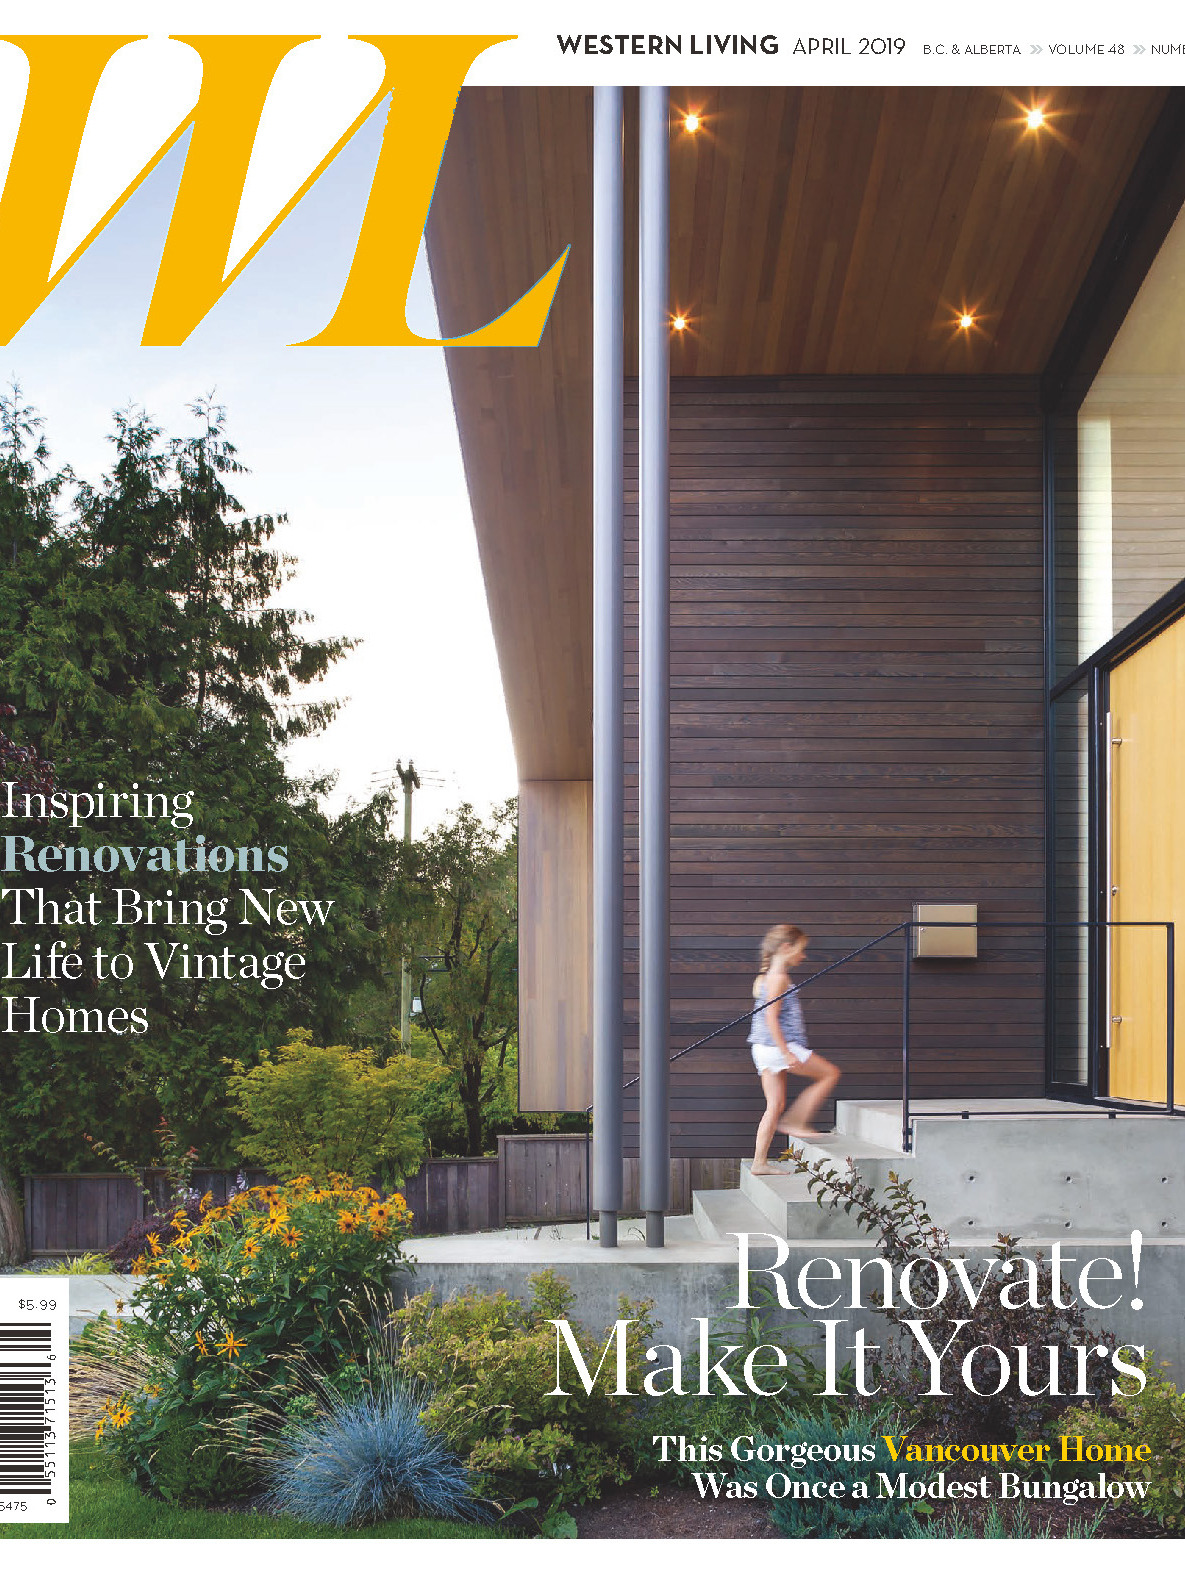 《Western Living》加拿大时尚家居杂志2019年04月号